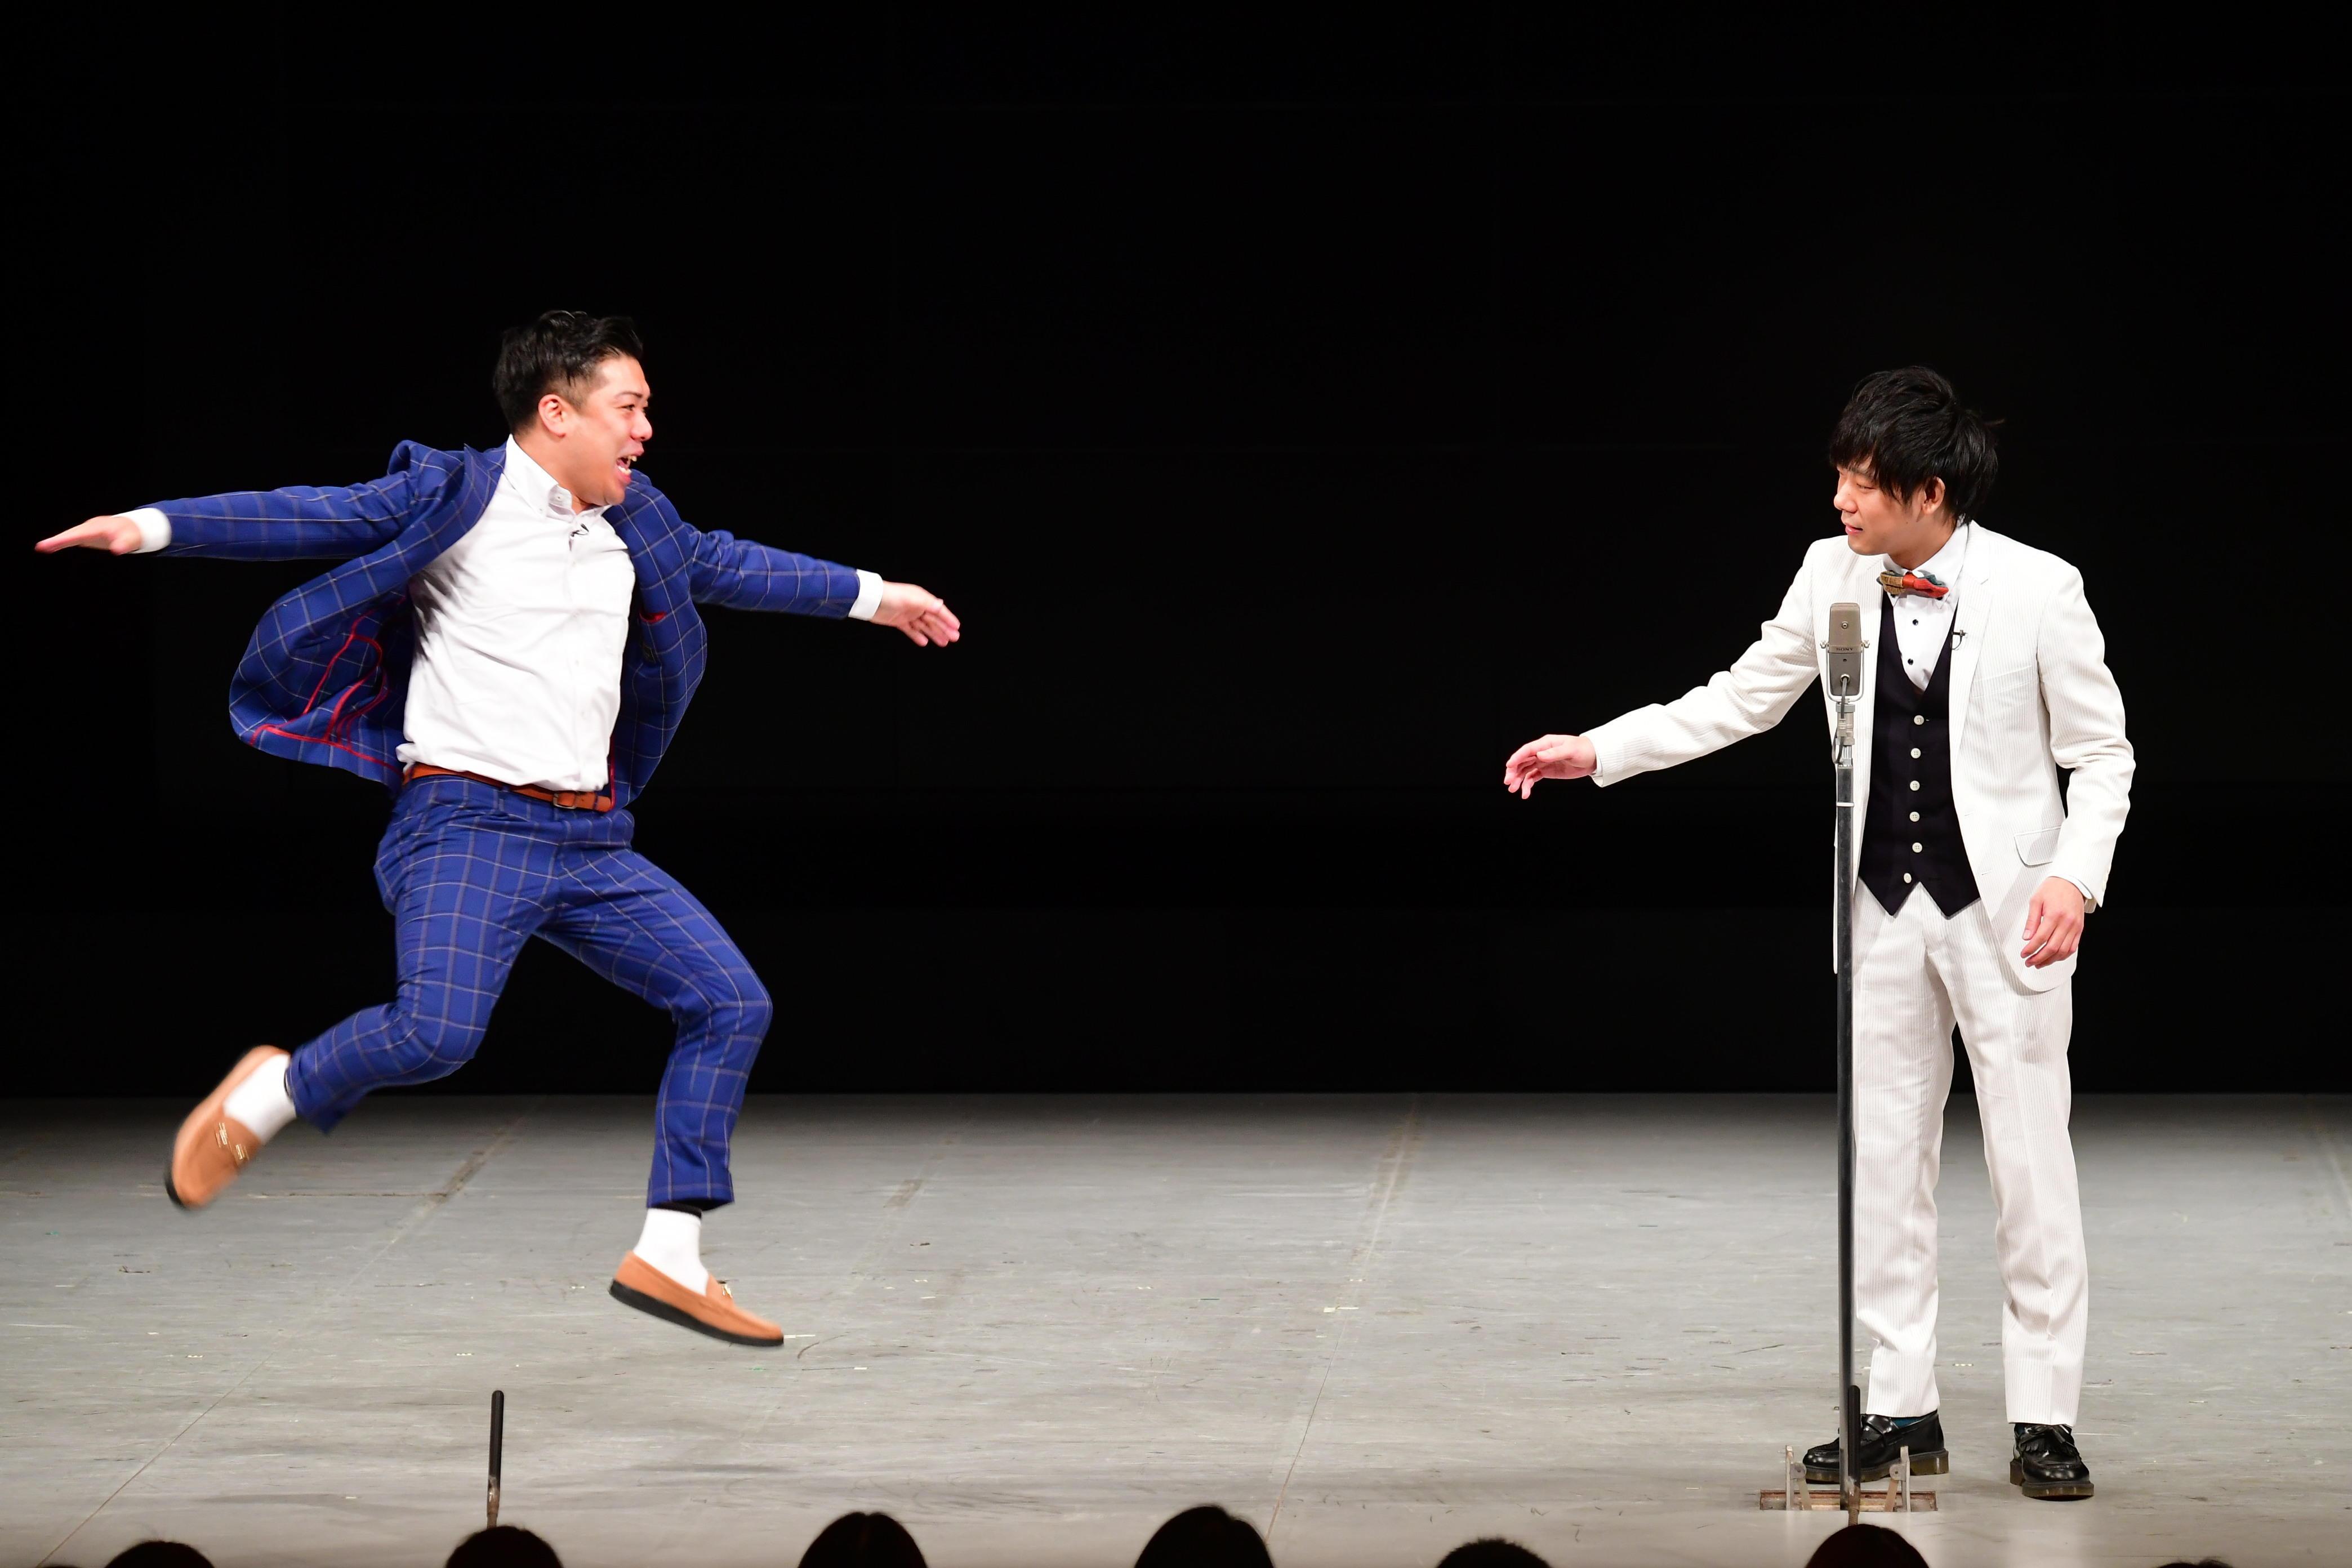 http://news.yoshimoto.co.jp/20190128184938-8193444c63f859aa1d5347315d41f13873848d87.jpg